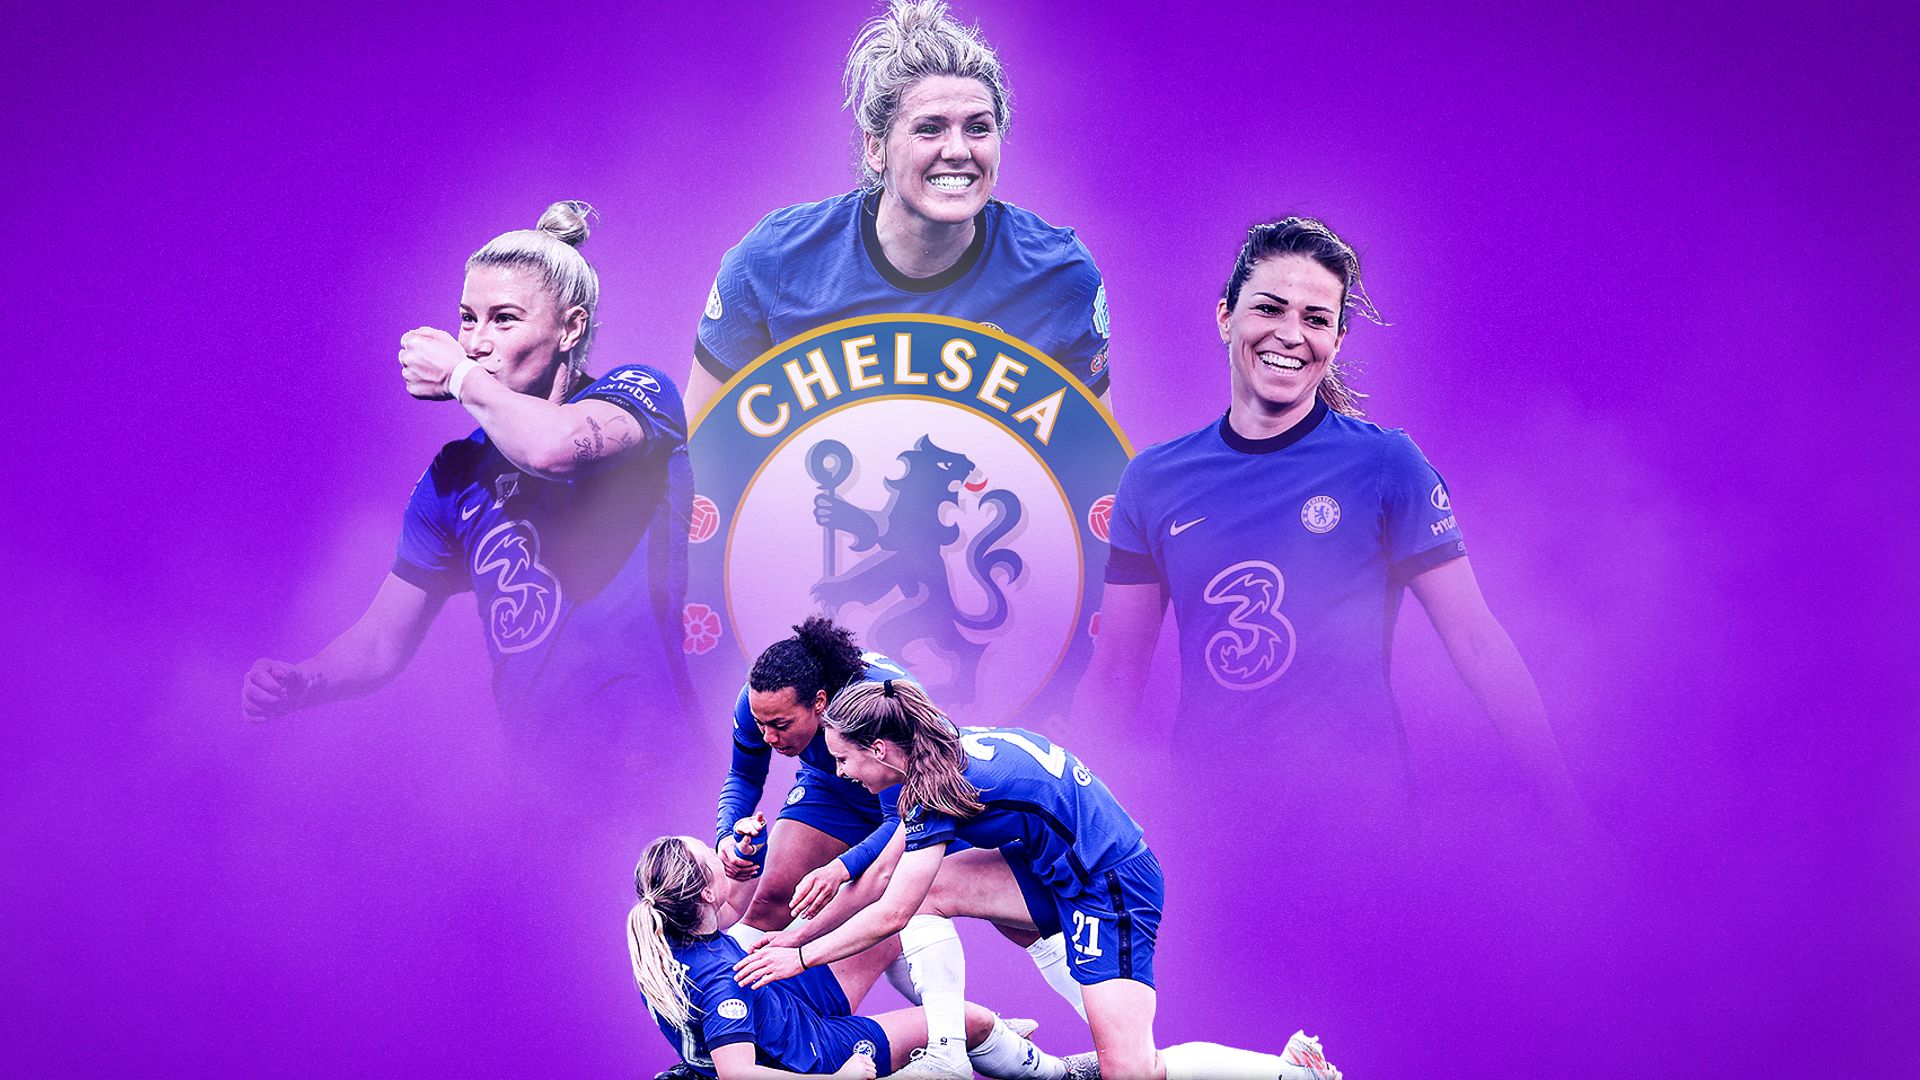 Chelsea Women realising their CL final dreams